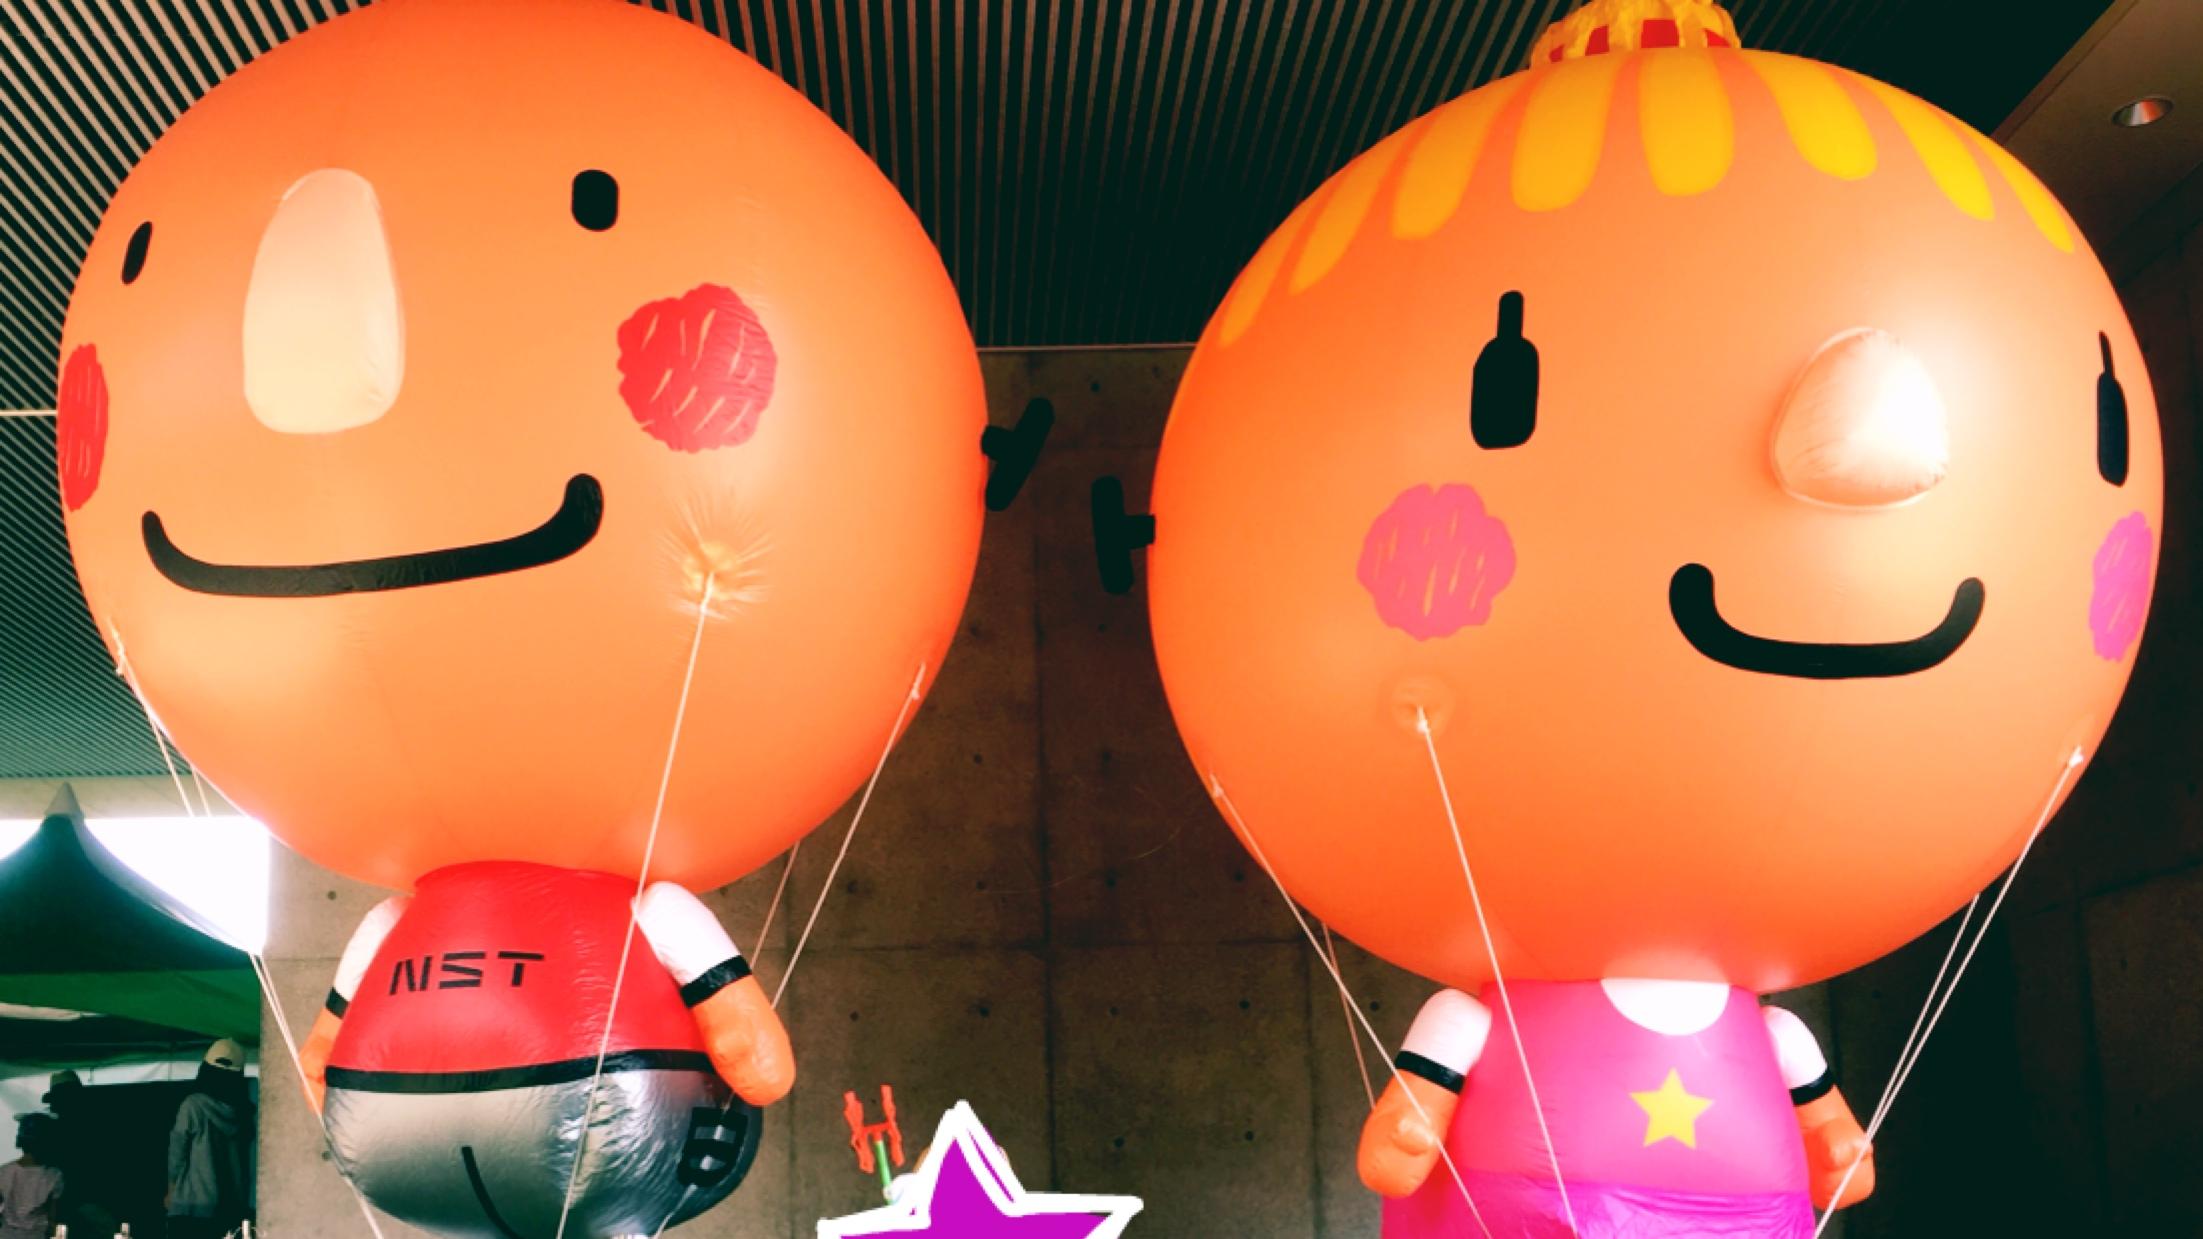 NSTまつり2018 トークショー スペシャルゲストに『新しい地図』香取・草彅・稲垣くる〜〜!